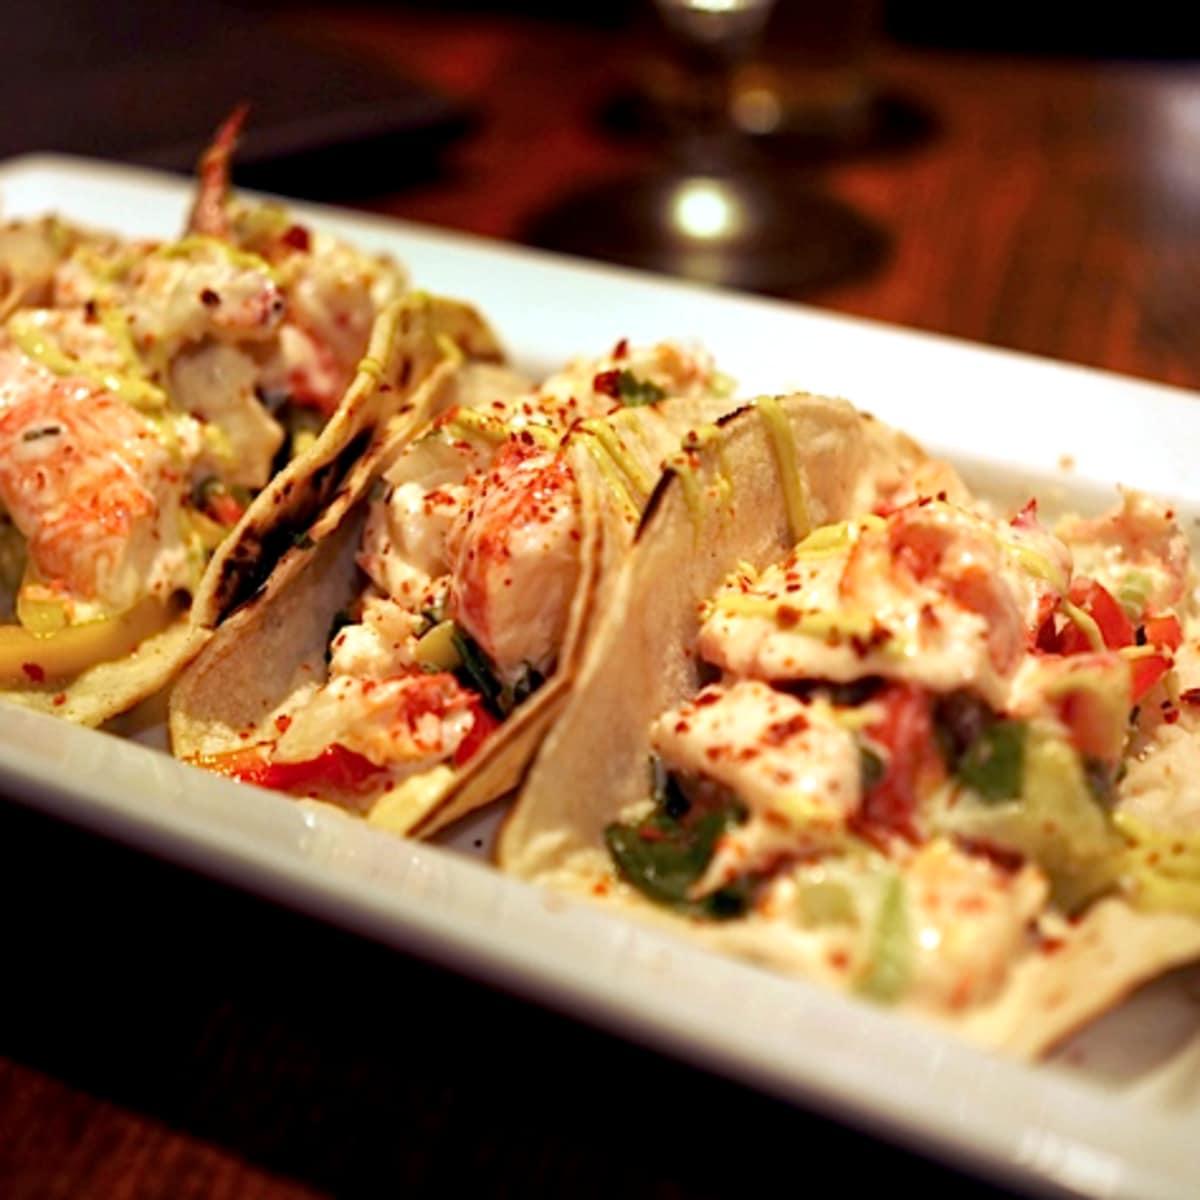 Jonathan's the Rub lobster tacos